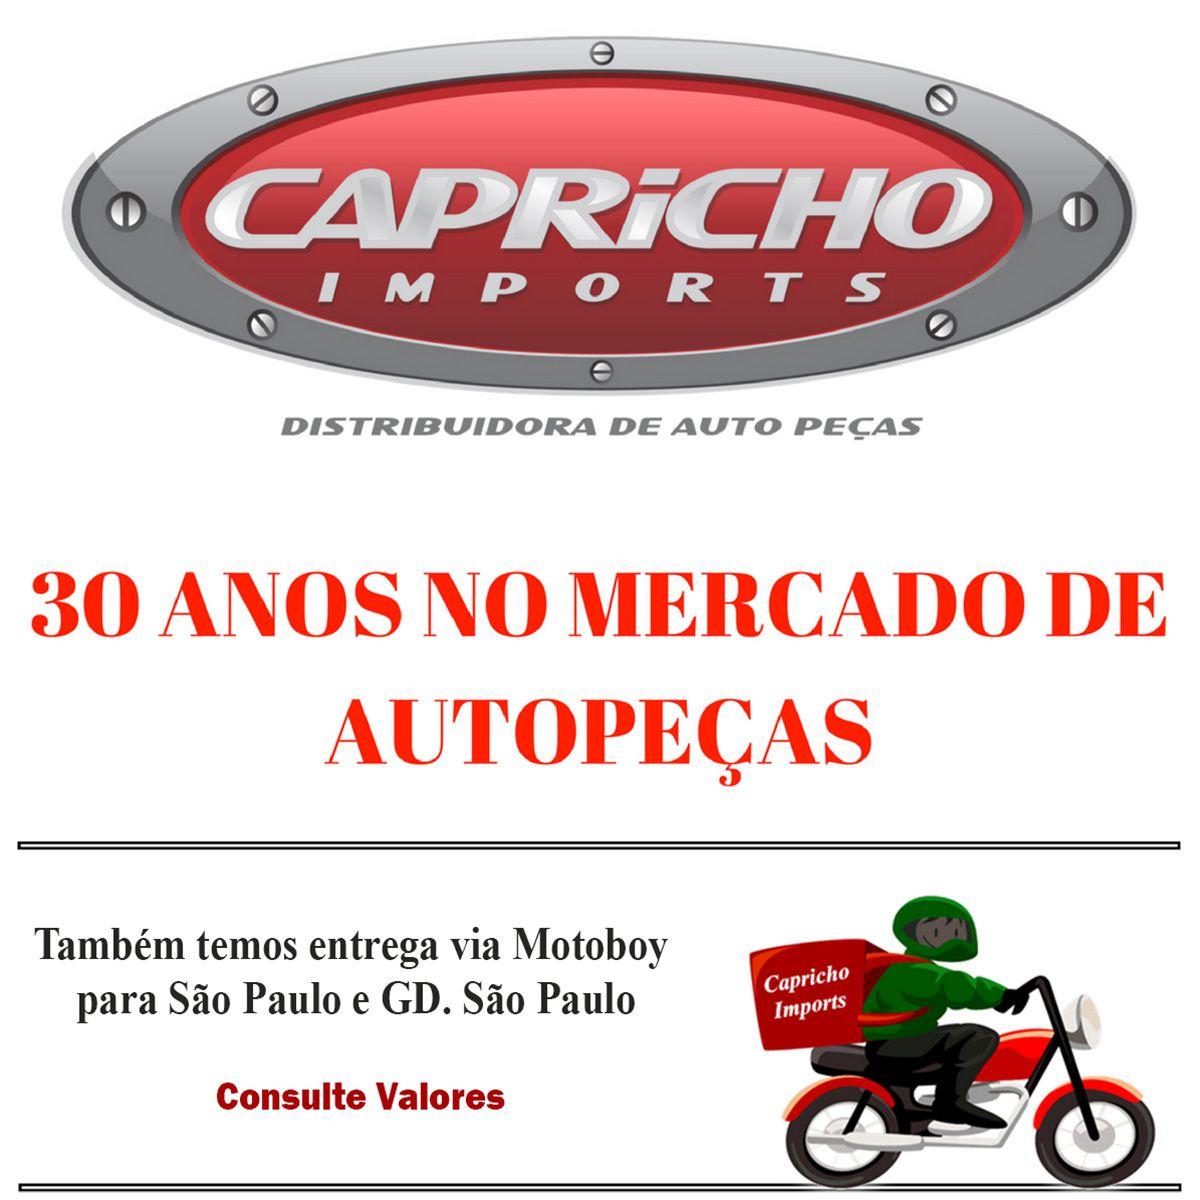 DIAFRAGMA TAMPA DE VALVULA VW PASSAT CC TOUAREG AUDI Q7 PORSCHE CAYENNE